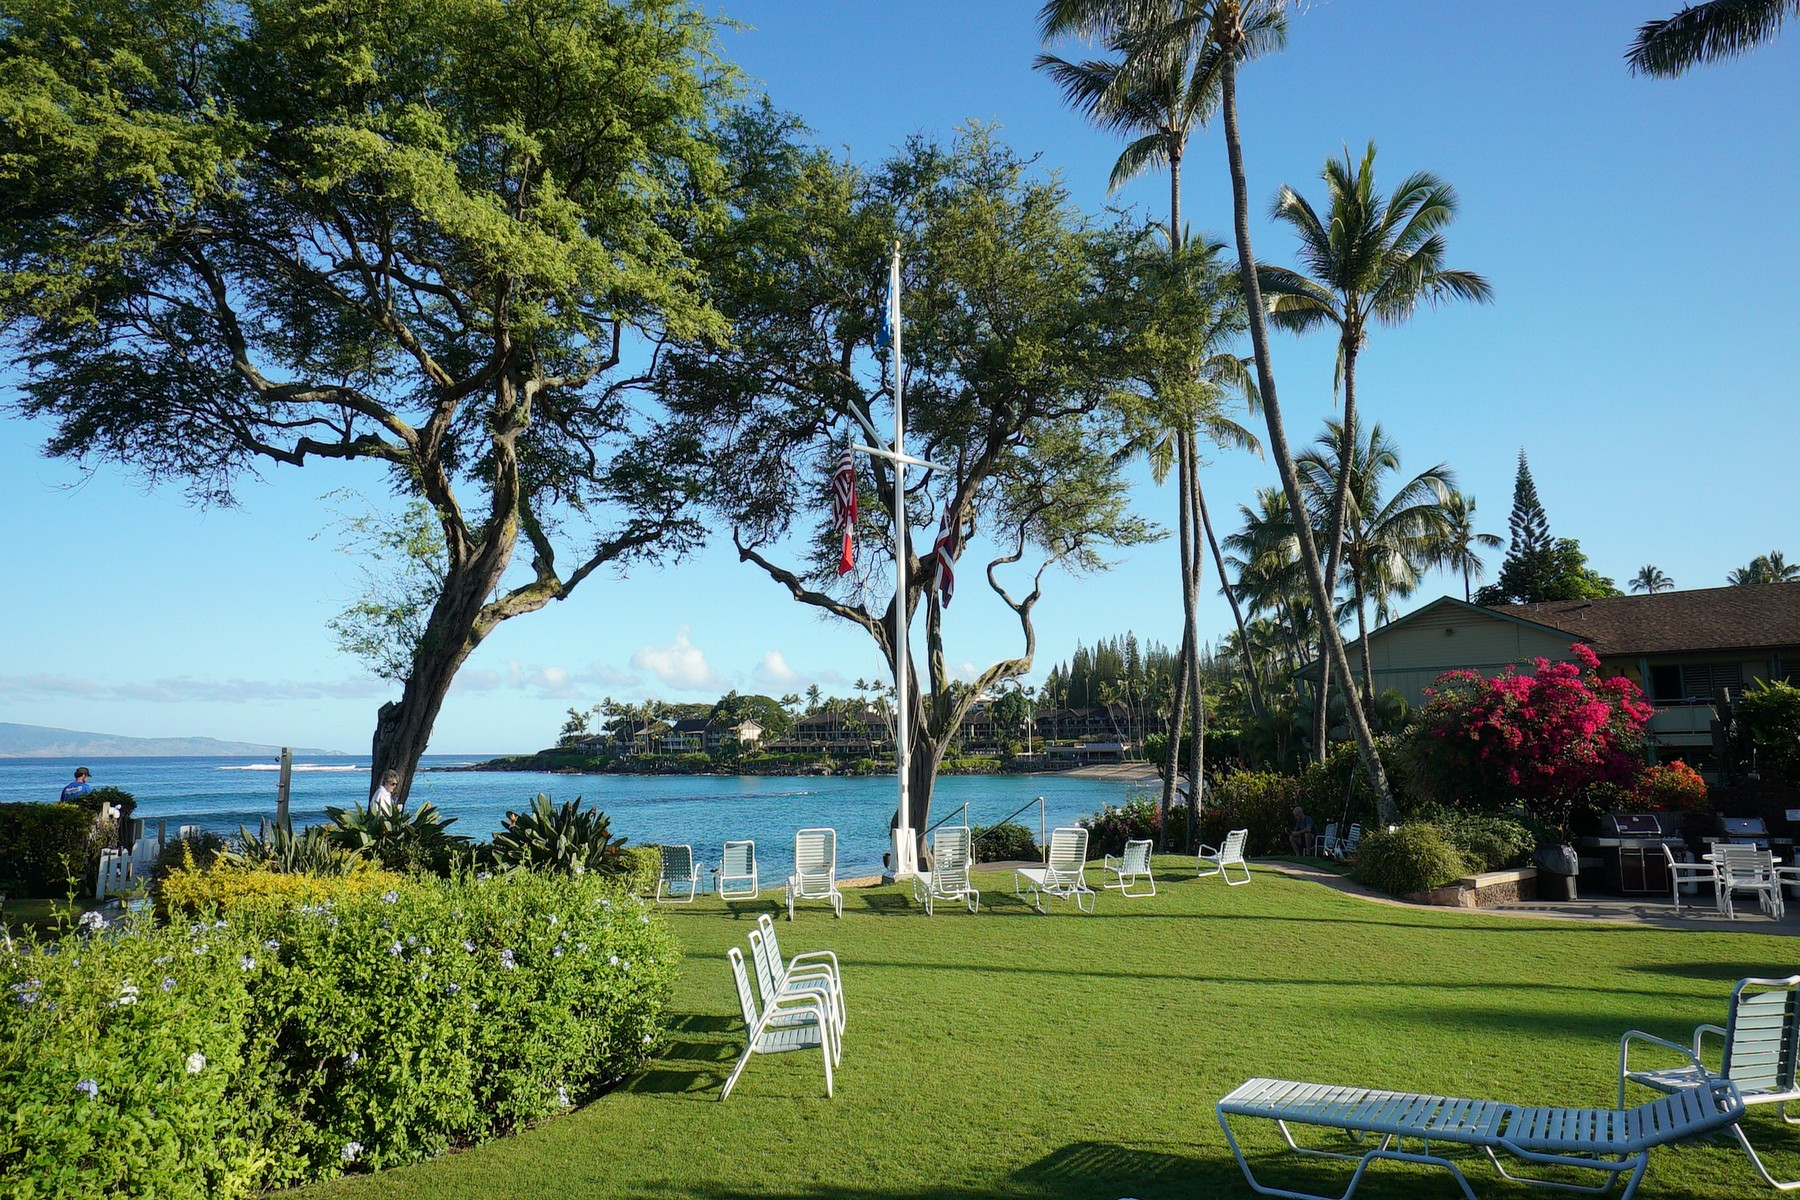 共管式独立产权公寓 为 销售 在 Slice of Paradise, Napili Surf 50 Napili Place, Napili Surf 218 捕鲸镇, 夏威夷, 96761 美国